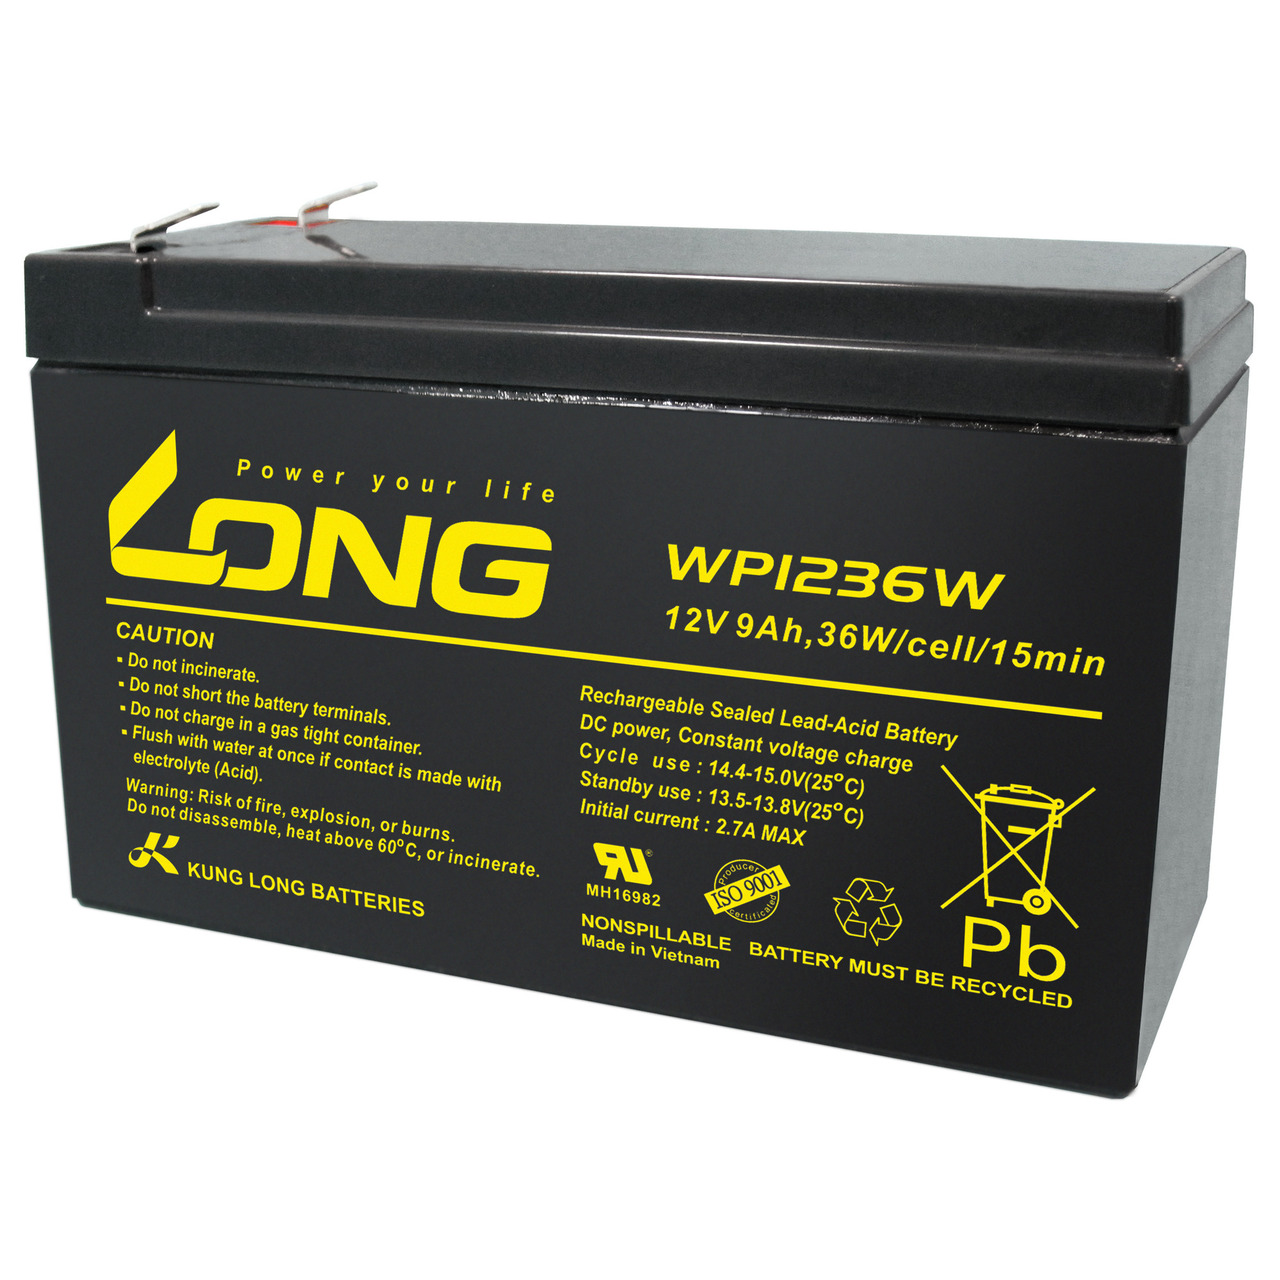 Kung Long Blei-AGM-Akku WP1236W- 12V- 36 W- 9Ah